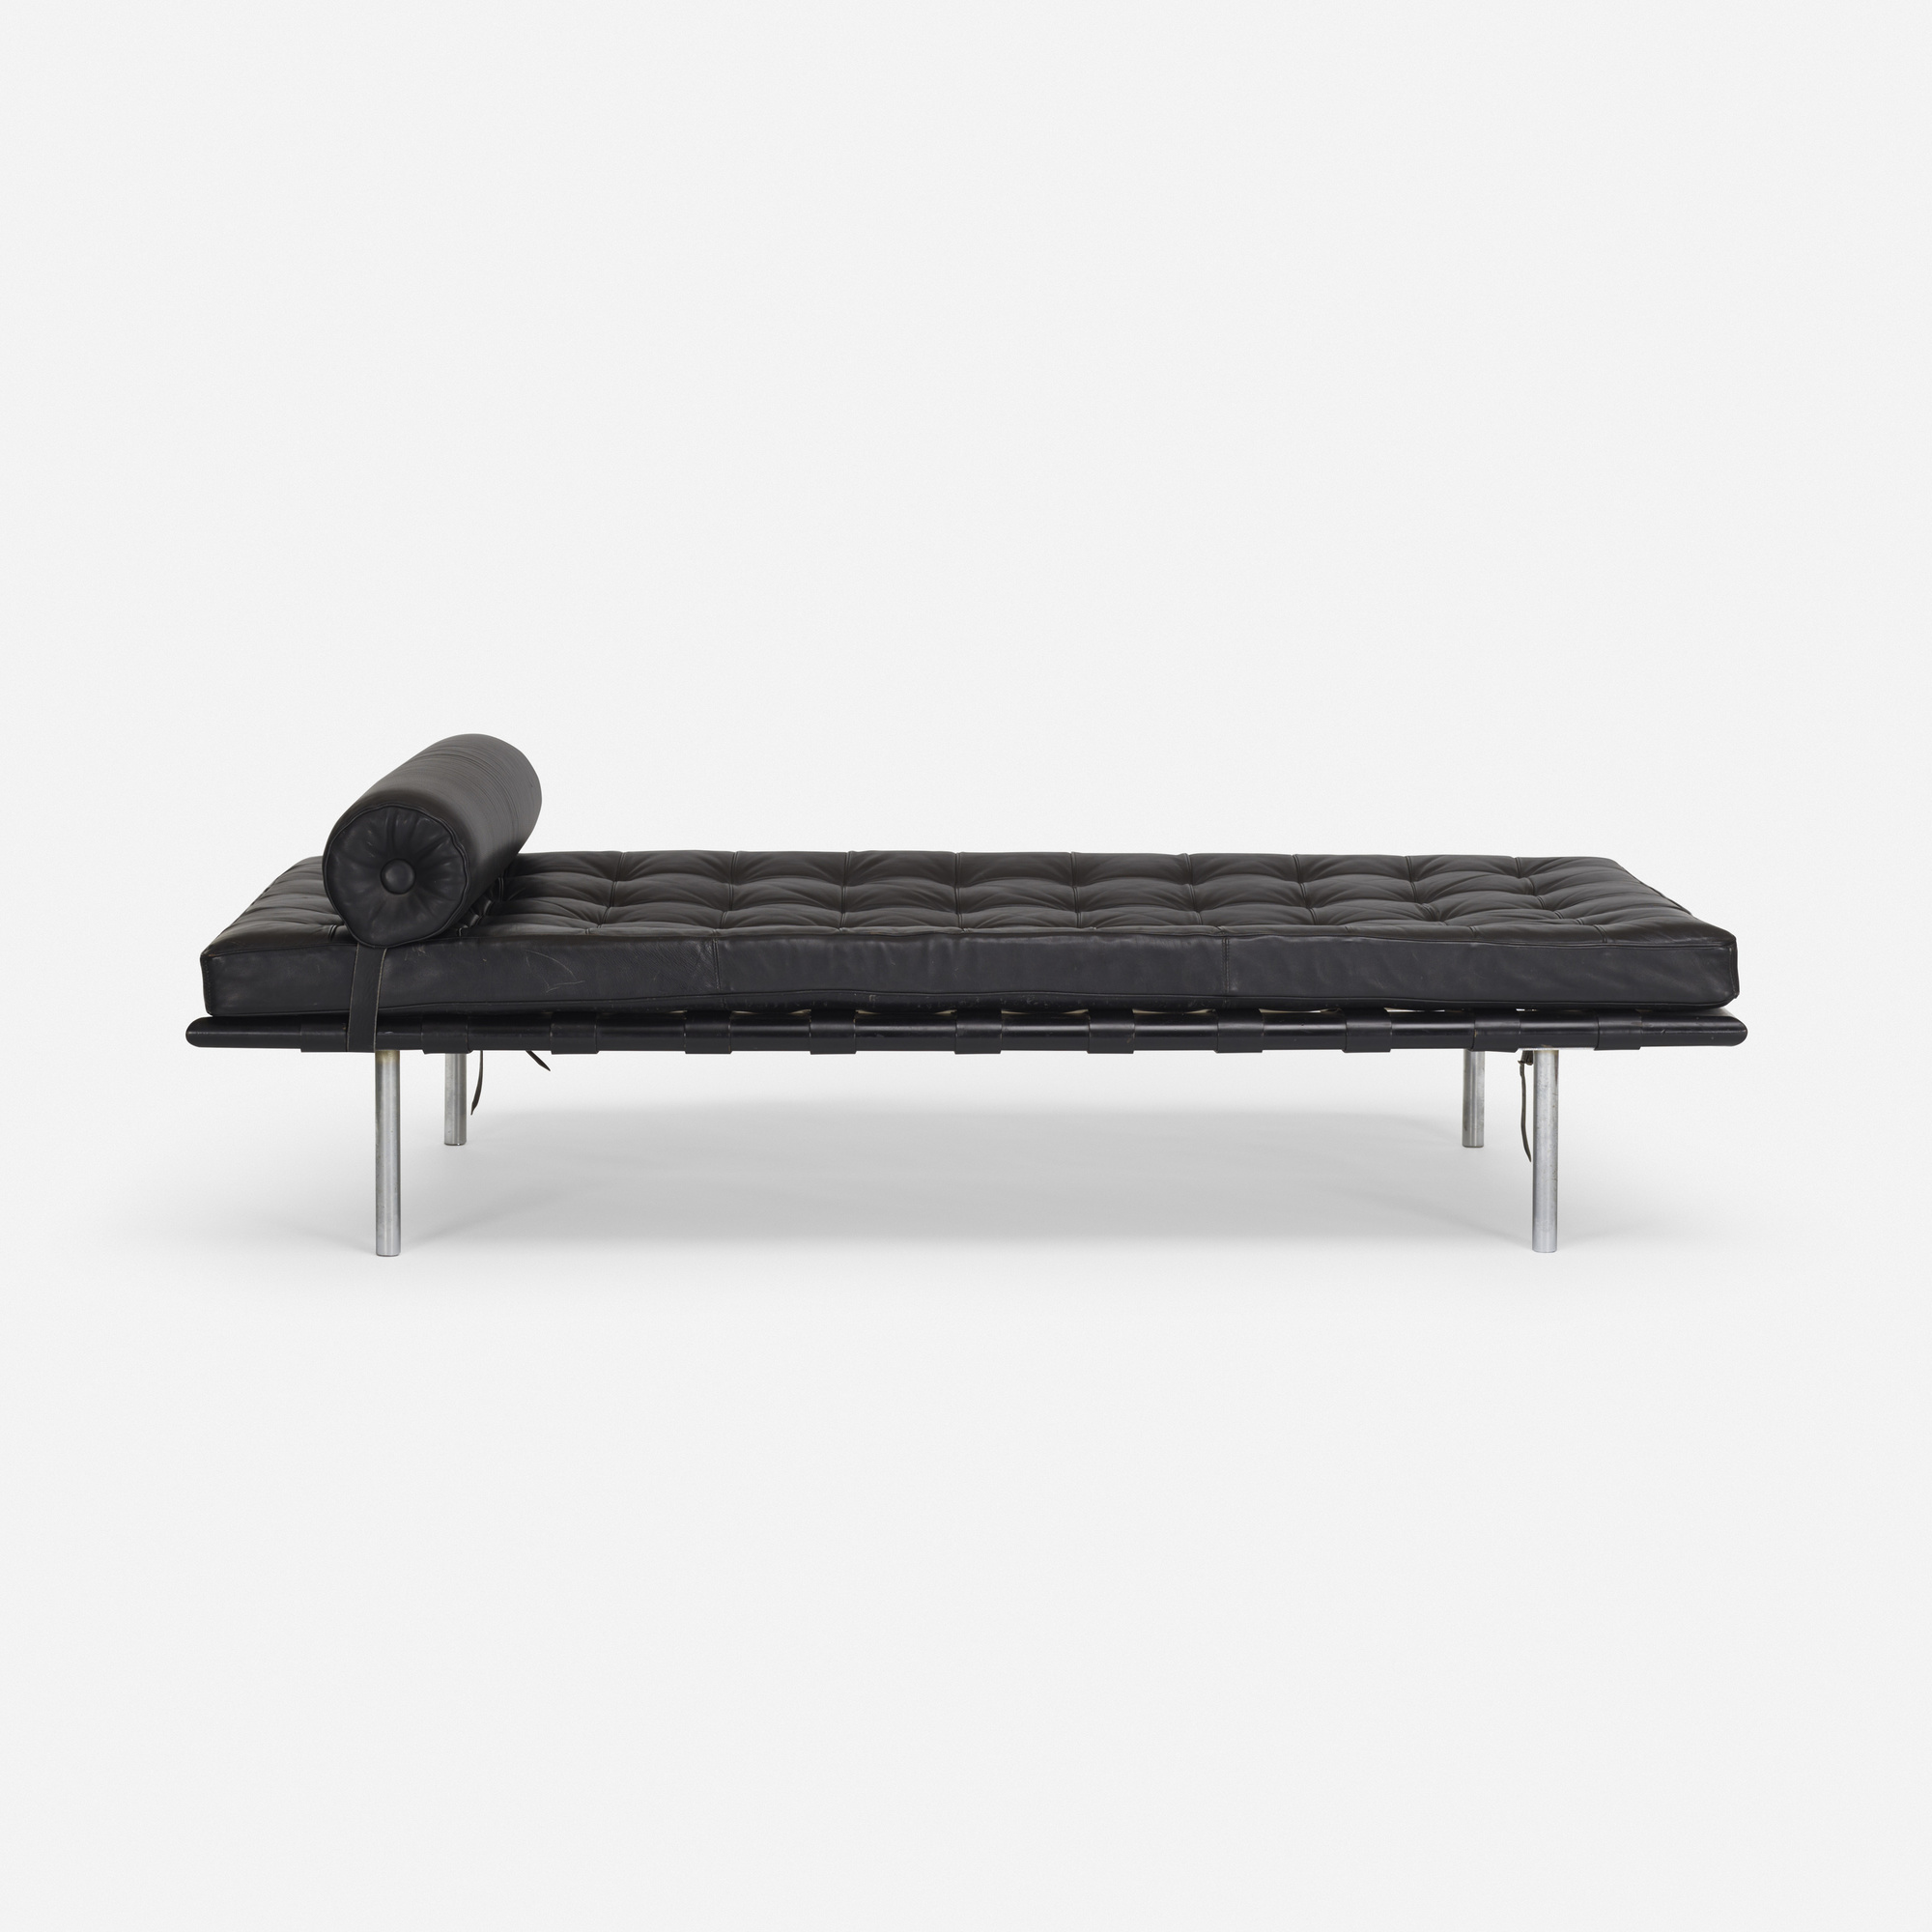 333 Ludwig Mies Van Der Rohe Barcelona Daybed Art Design 19